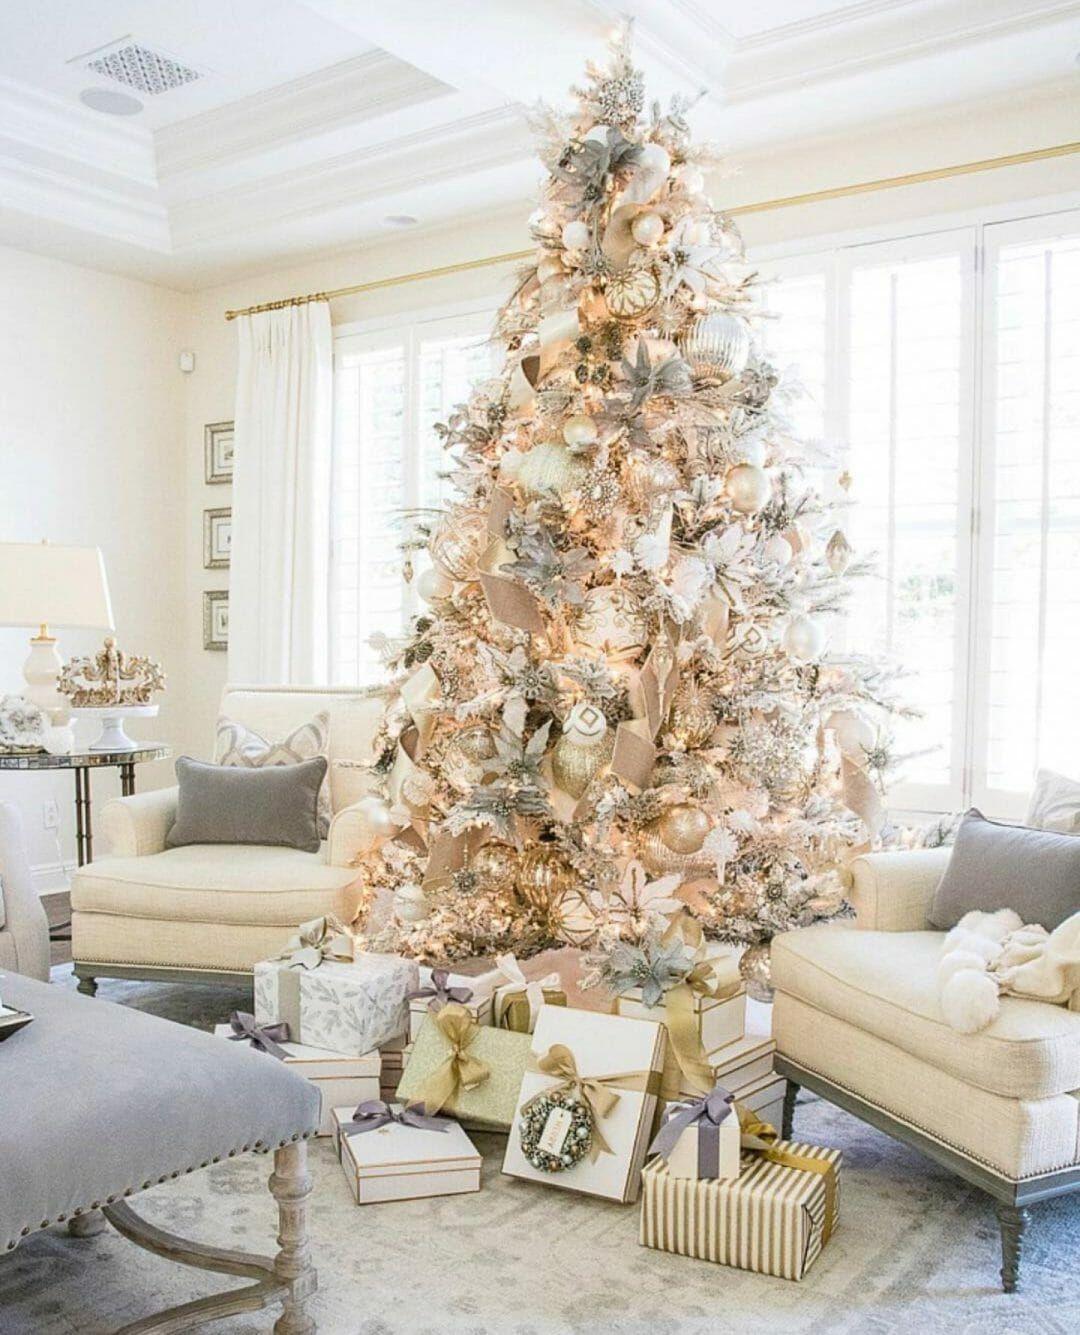 40 Stunning Christmas Tree Ideas Your Family Will Love Christmas Apartment White Christmas Decor Elegant Christmas Trees